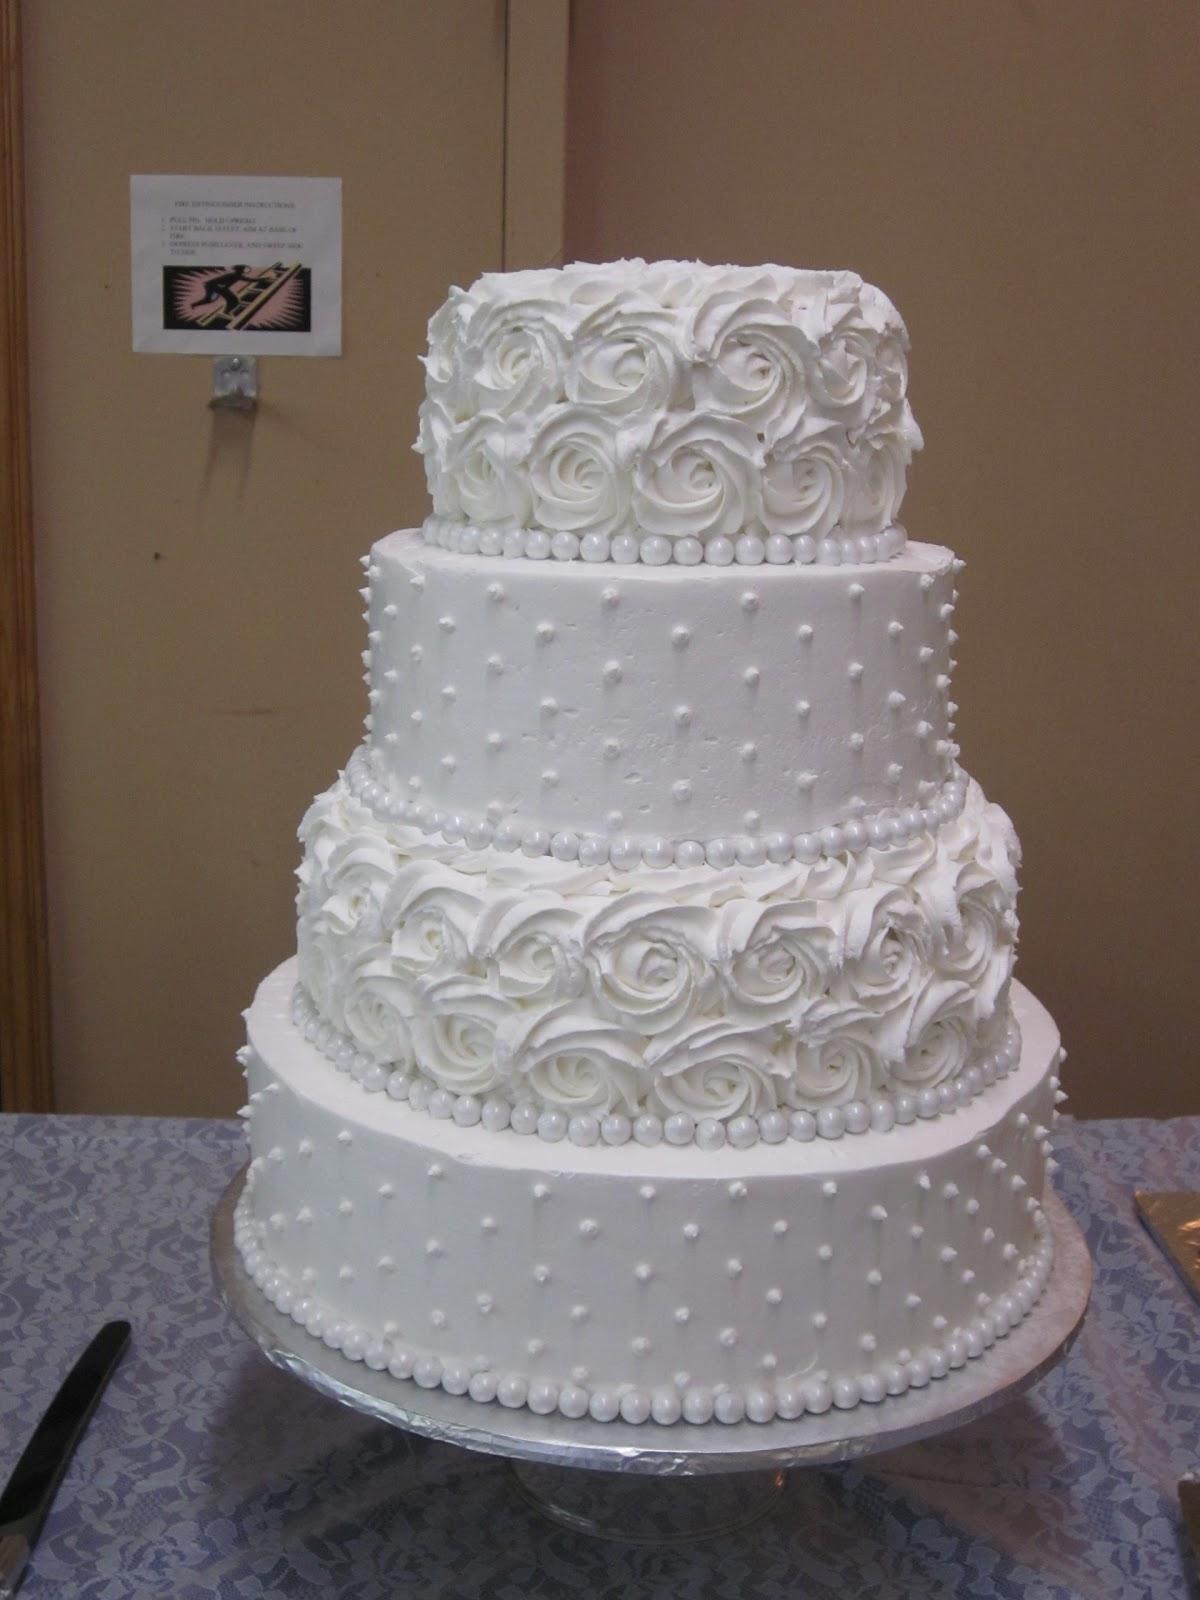 Wedding Cake Frosting Recipe — Dishmaps